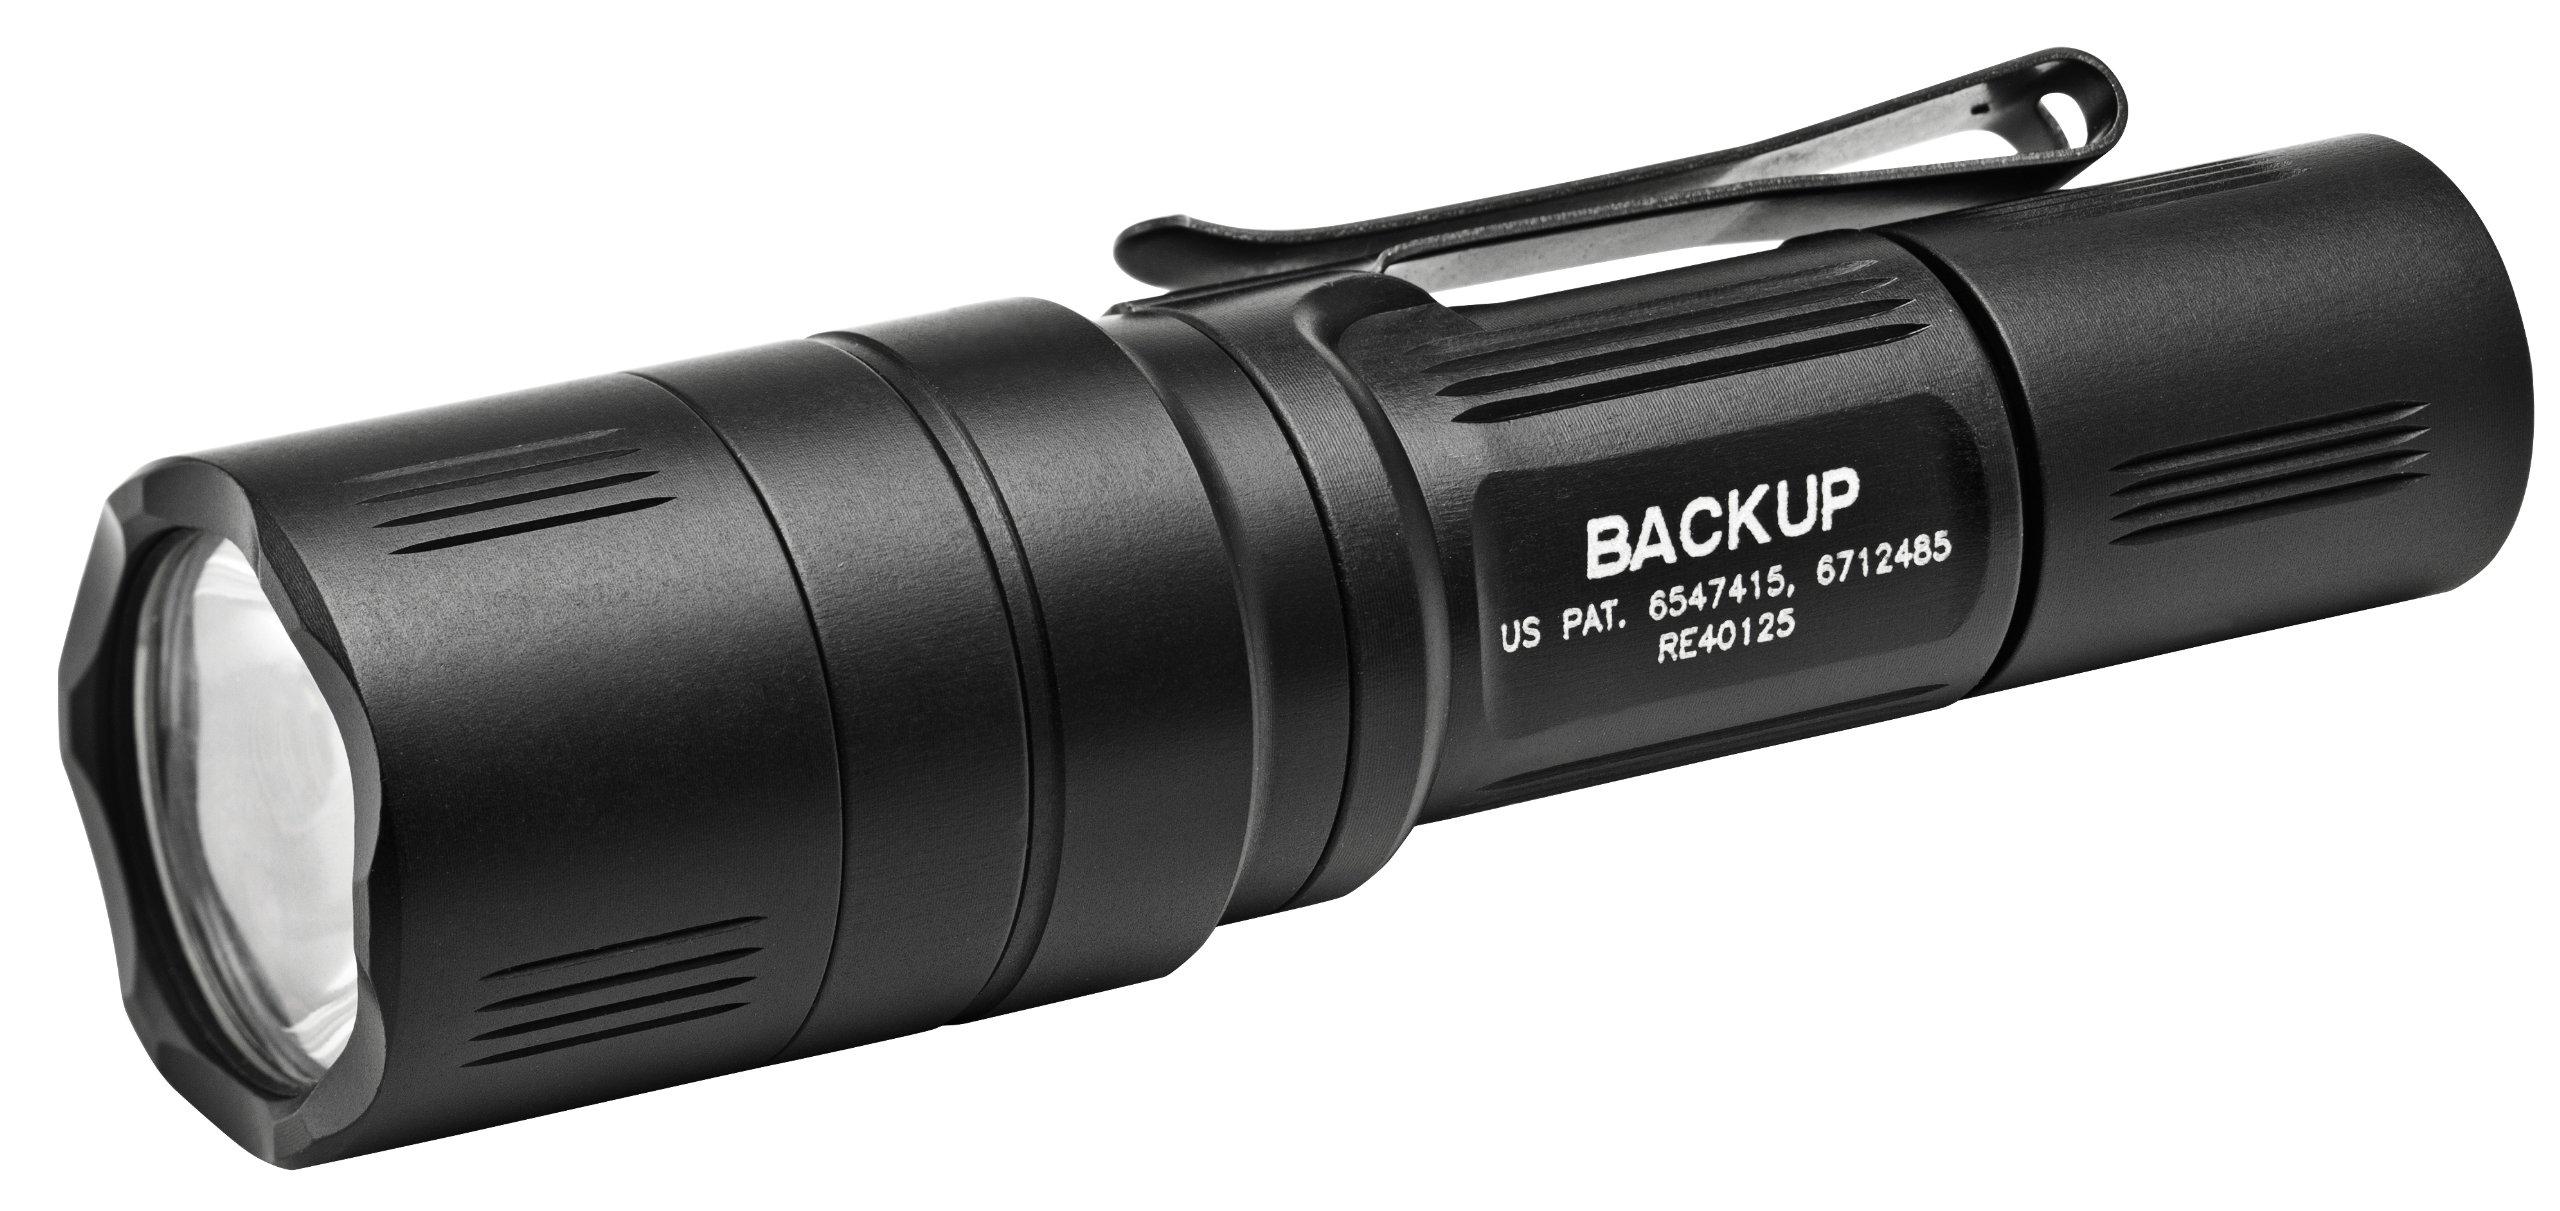 SureFire  EB1C-B-BK 200 Lumens Backup Series LED Flashlight with TIR Lens and Two-Way Clip